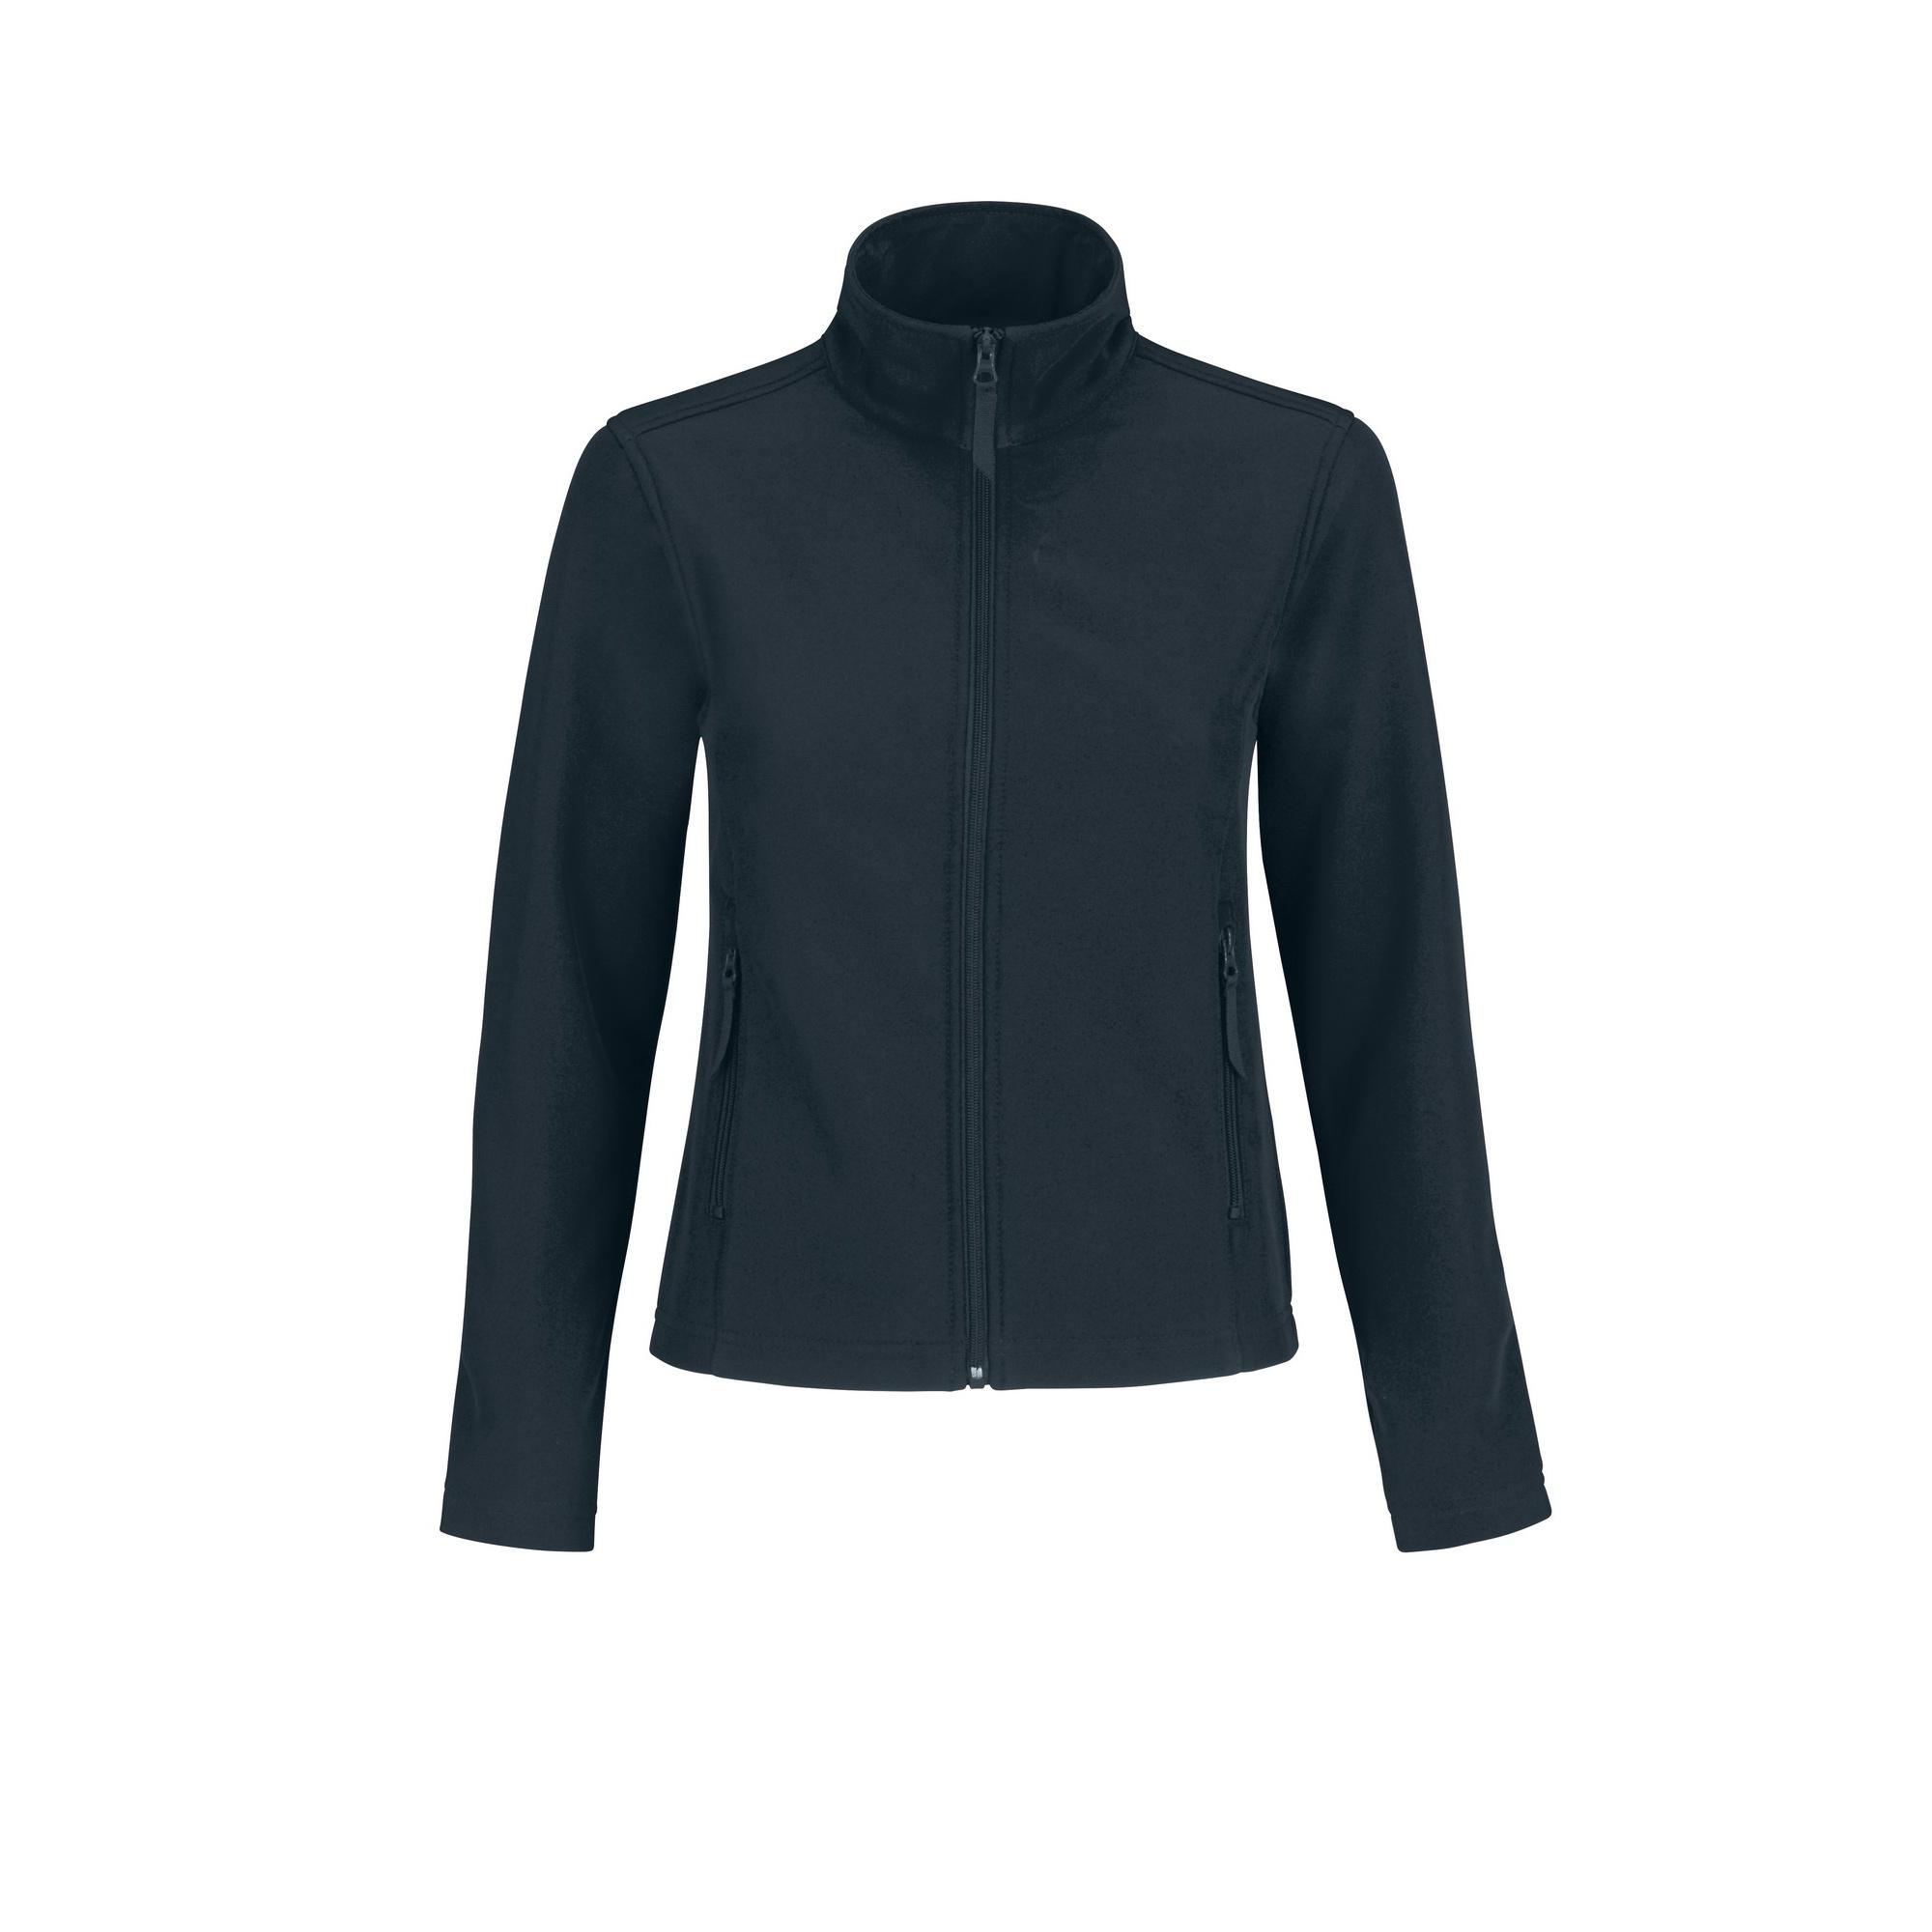 B&C Womens/Ladies Water Repellent Softshell Jacket (2XL) (Navy/ Neon Green)